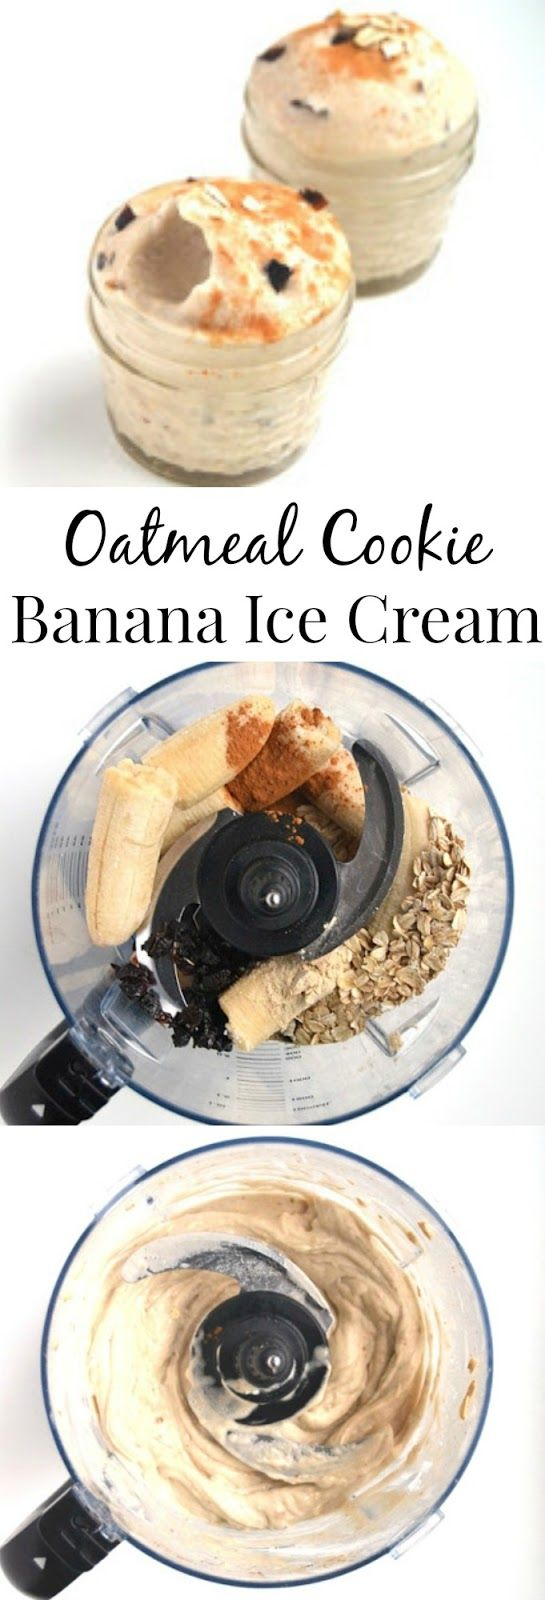 Oatmeal Cookie Banana Ice Cream #proteinicecream